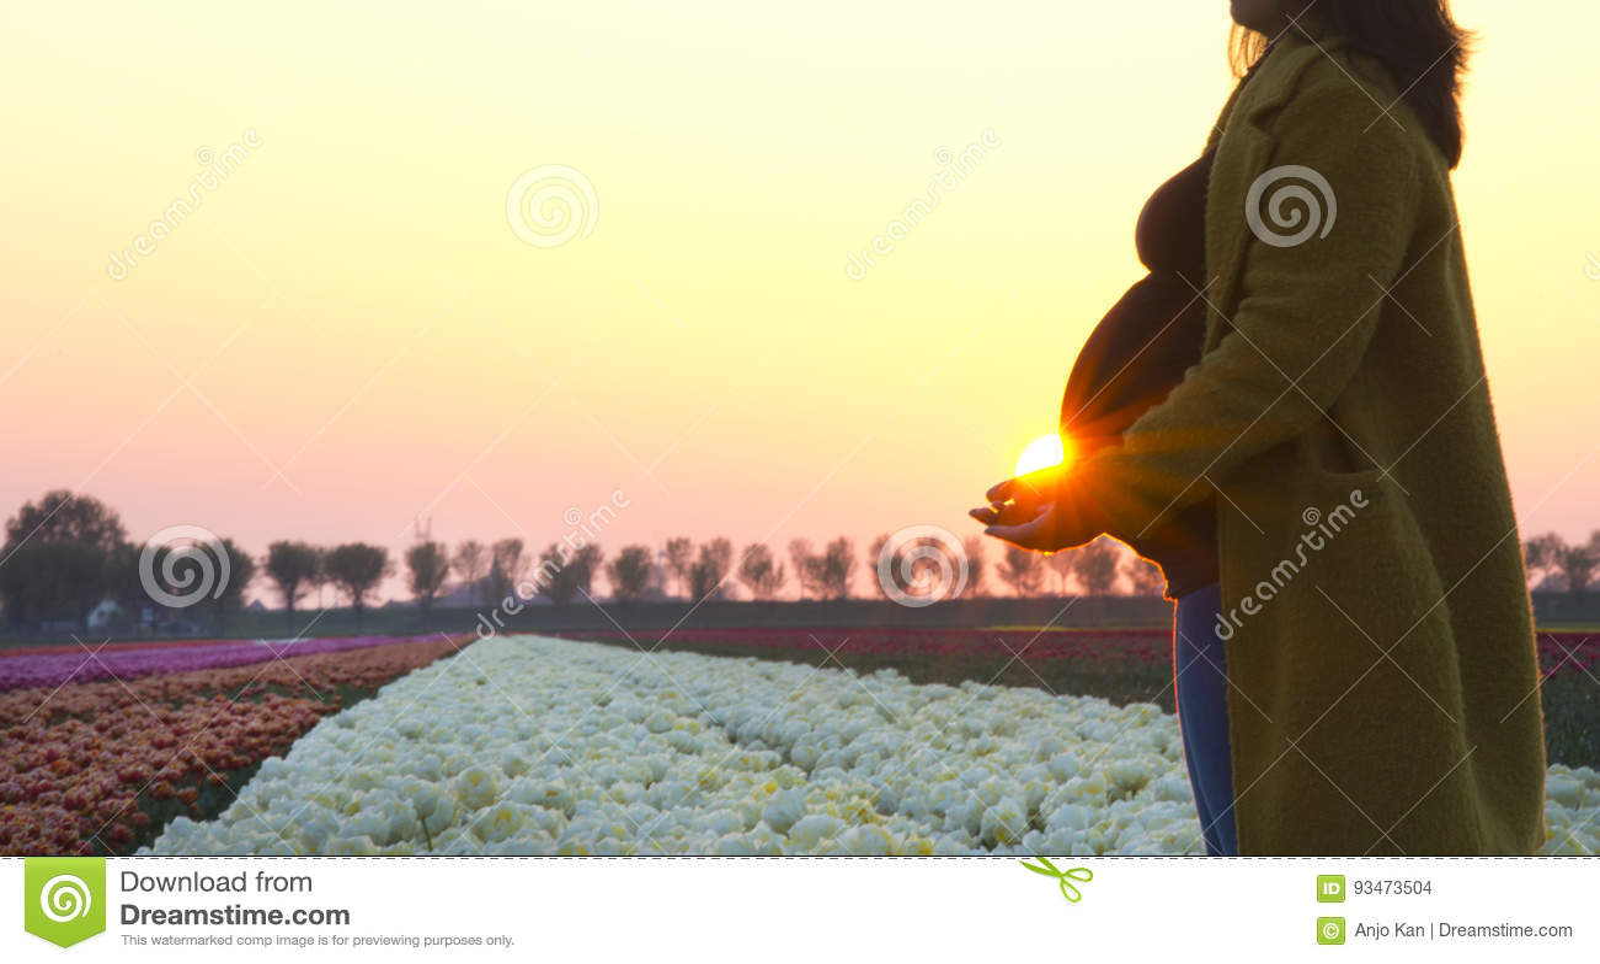 A pregnant woman`s silhouette